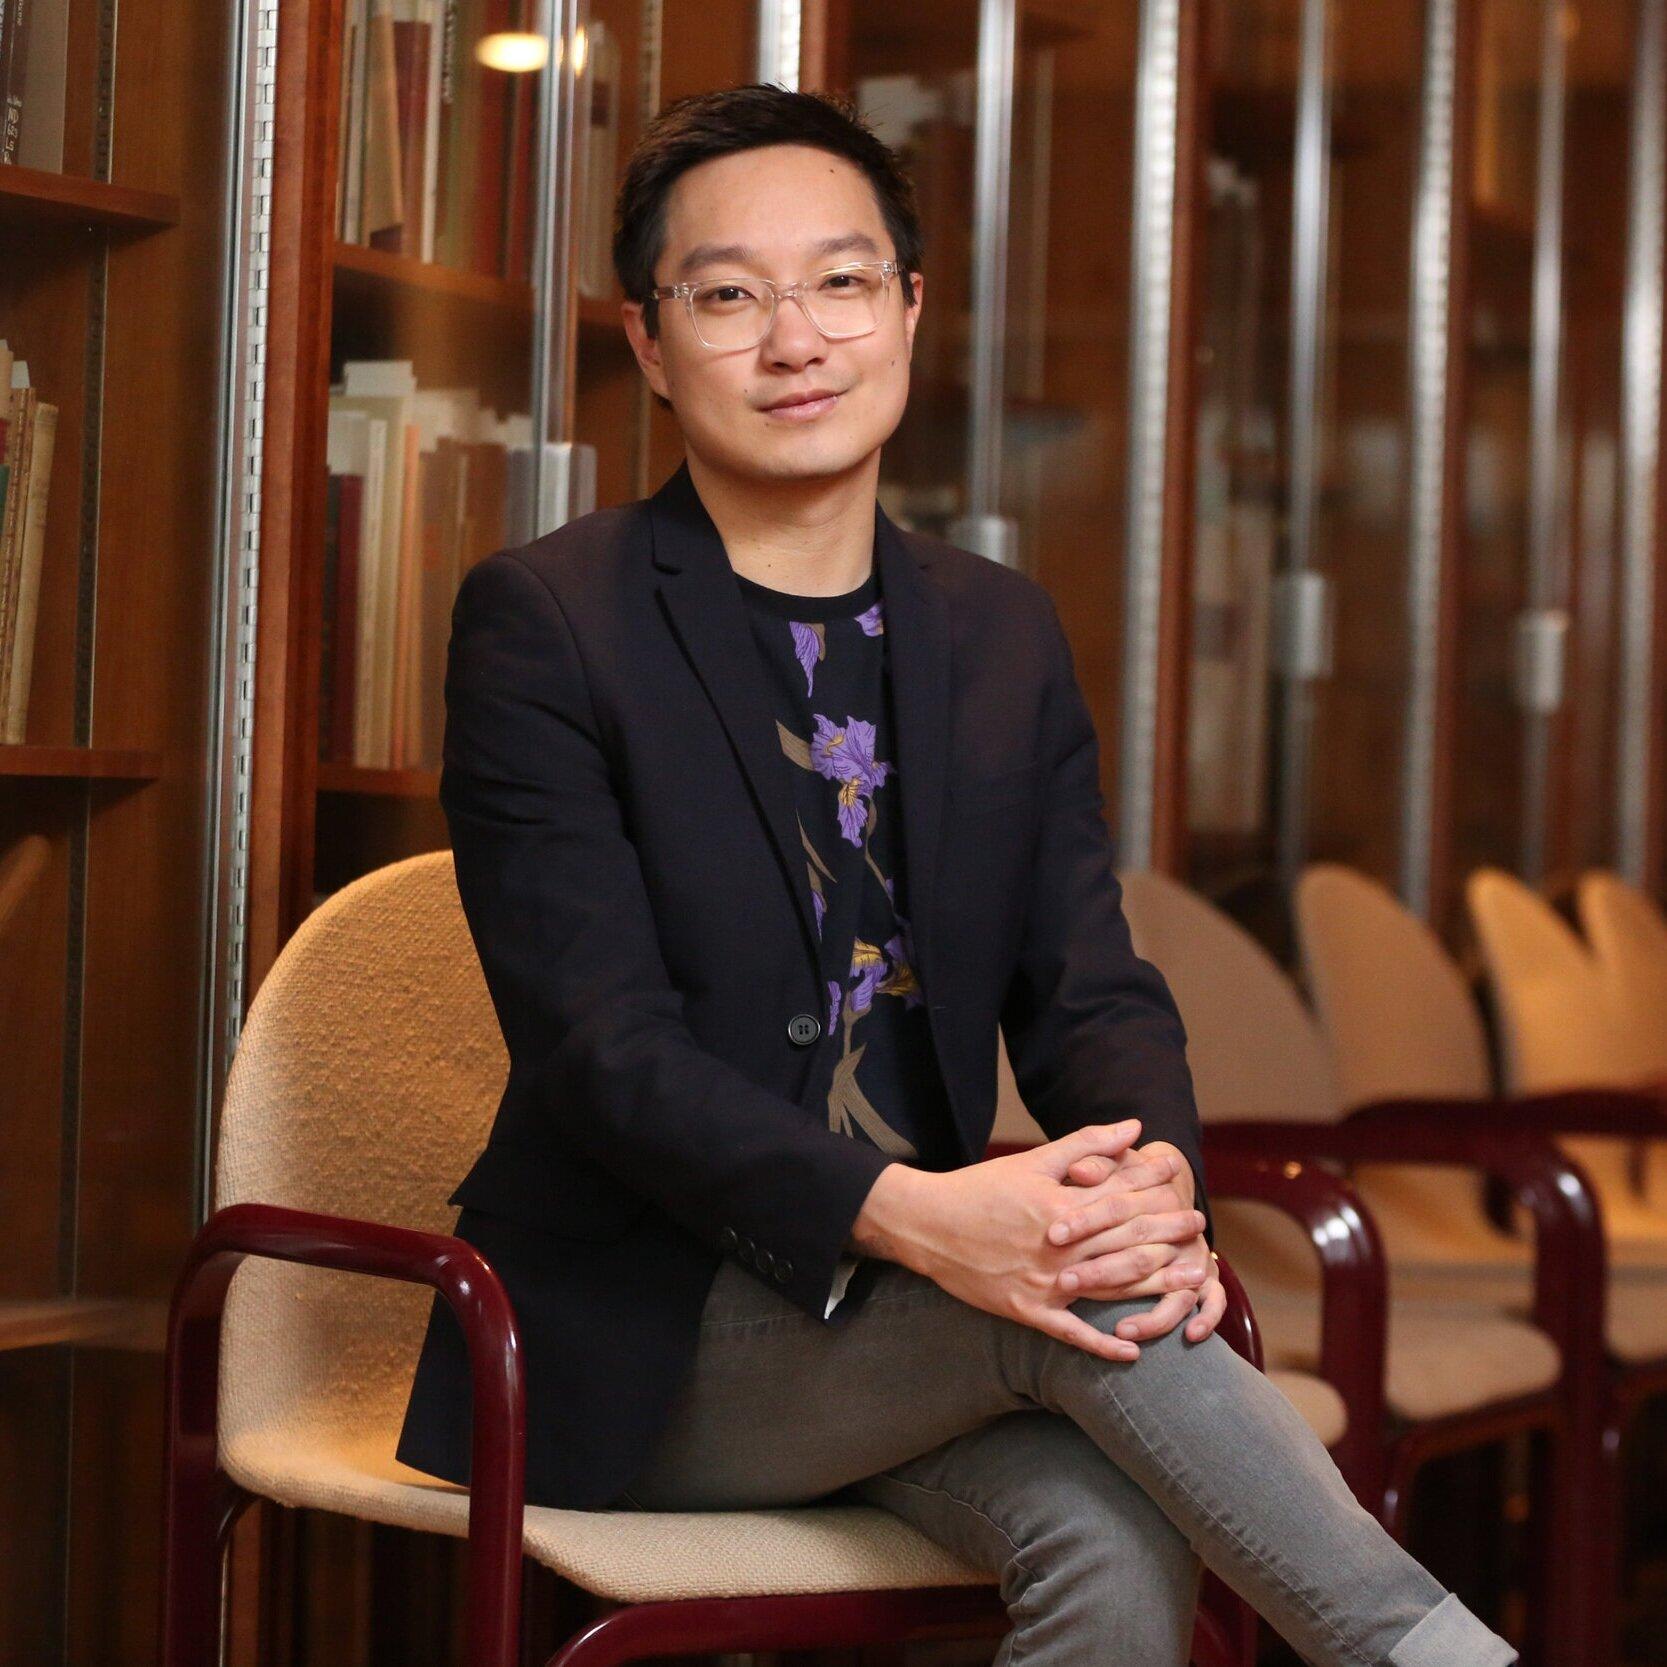 Artist Spotlight: Poet Chen Chen